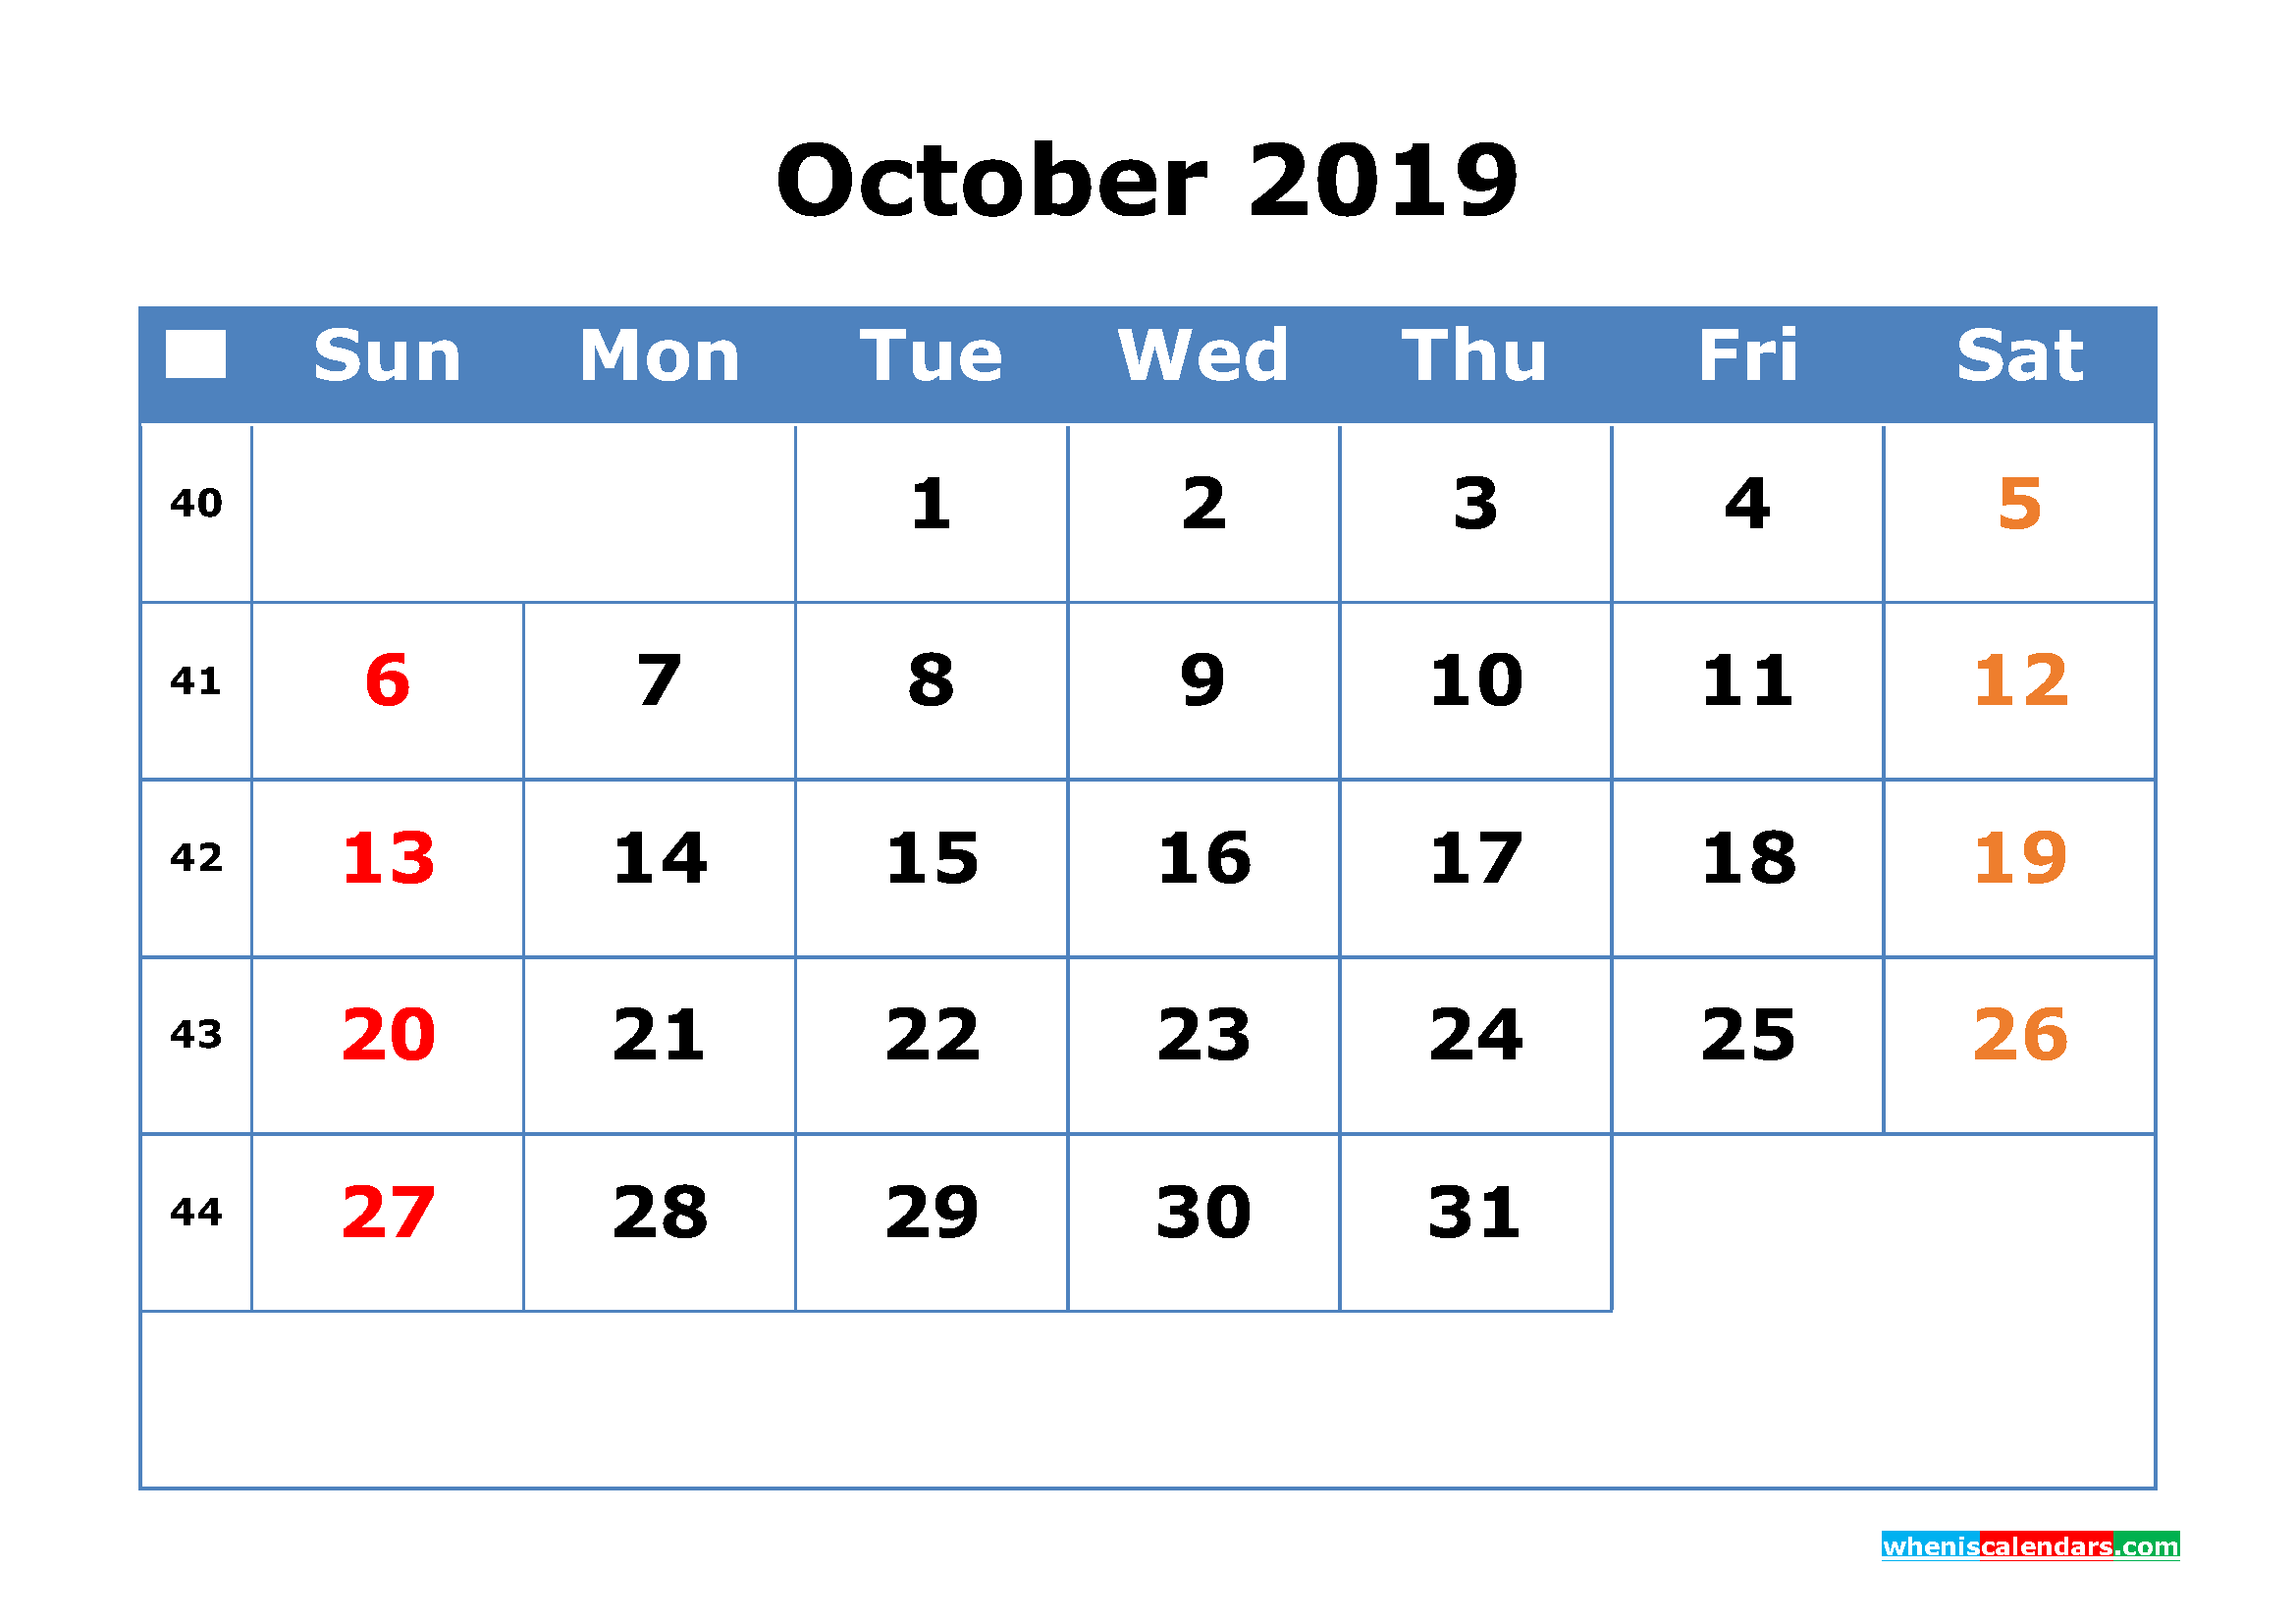 Printable Calendar 2019 October for Free Download as PDF, JPG